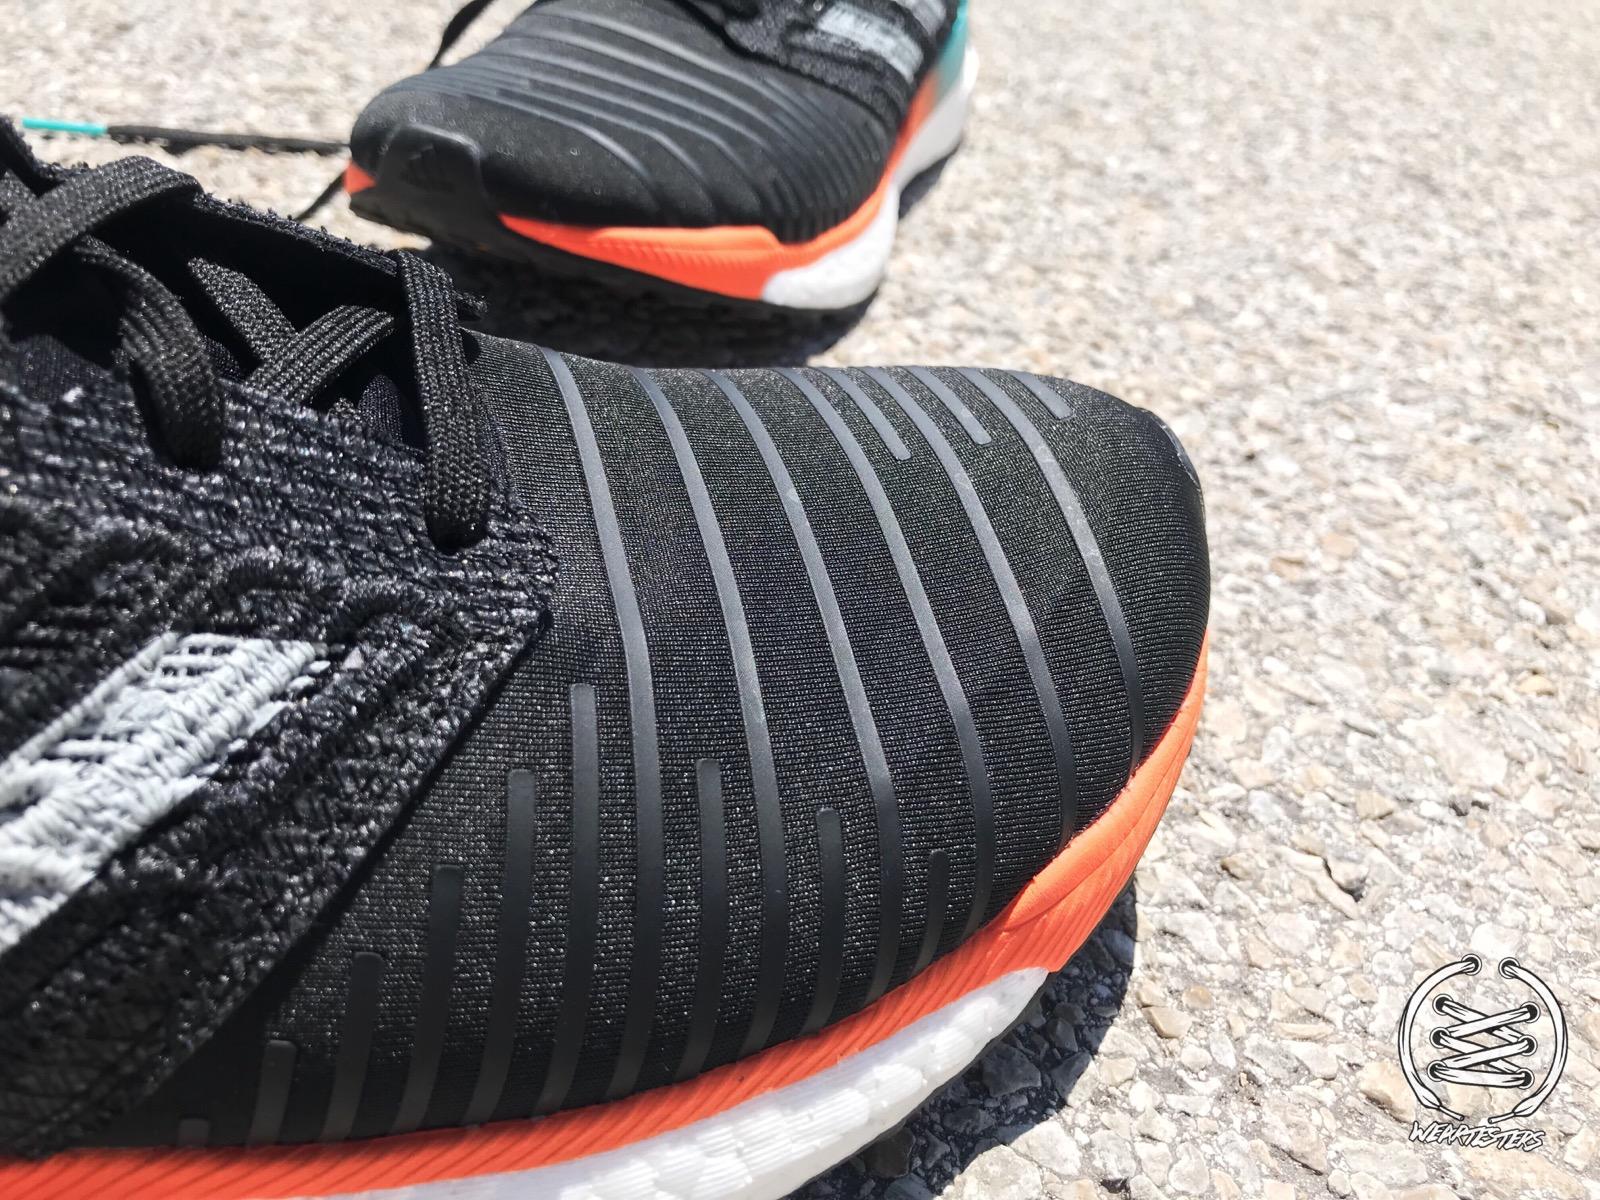 chaussures de sport bafa9 5b0d0 switzerland adidas performance solar boost avis e64cf 2b447